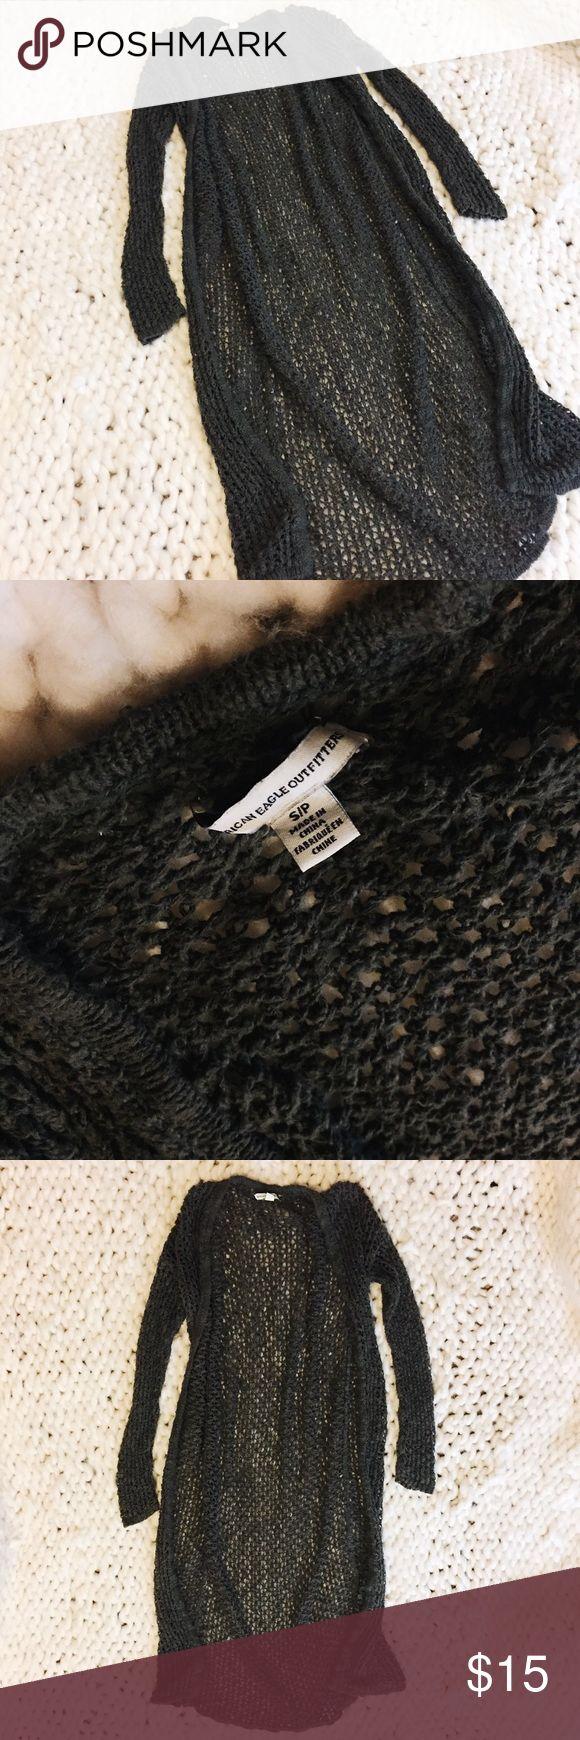 American Eagle Knit Cardigan American Eagle Long Knit Cardigan American Eagle Outfitters Sweaters Cardigans #americaneagleoutfitters